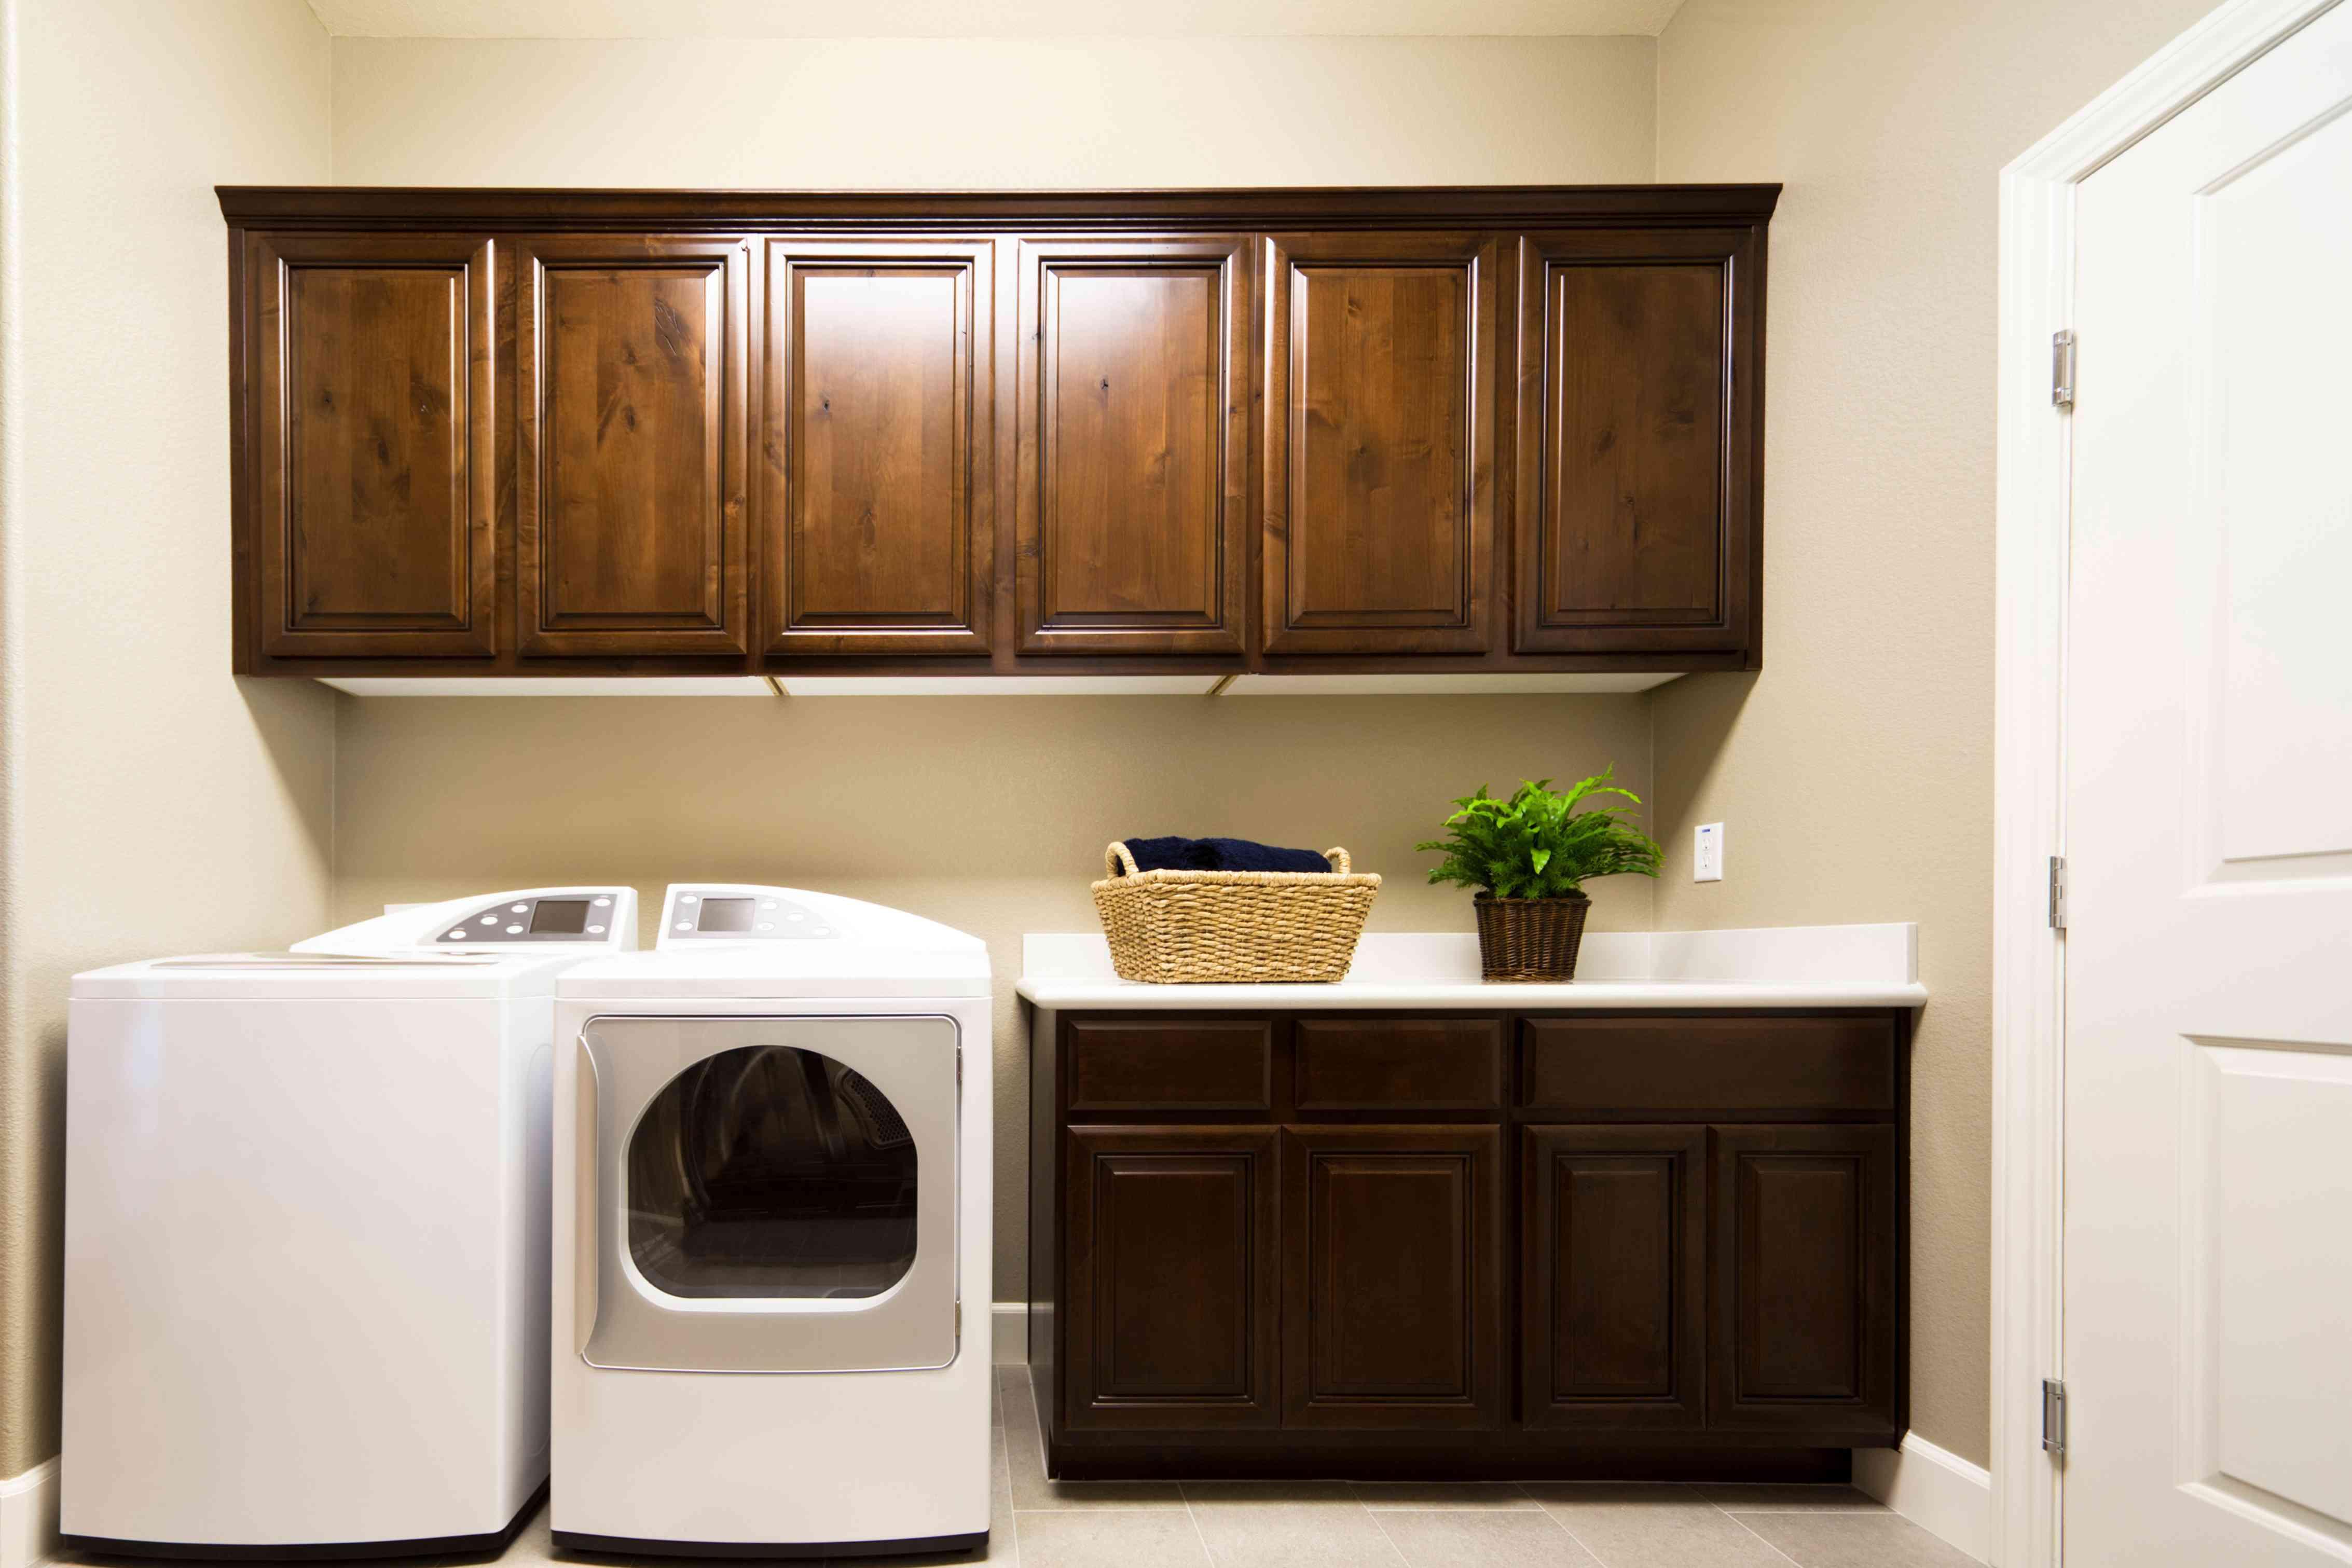 A laundry room full of cove raised panels